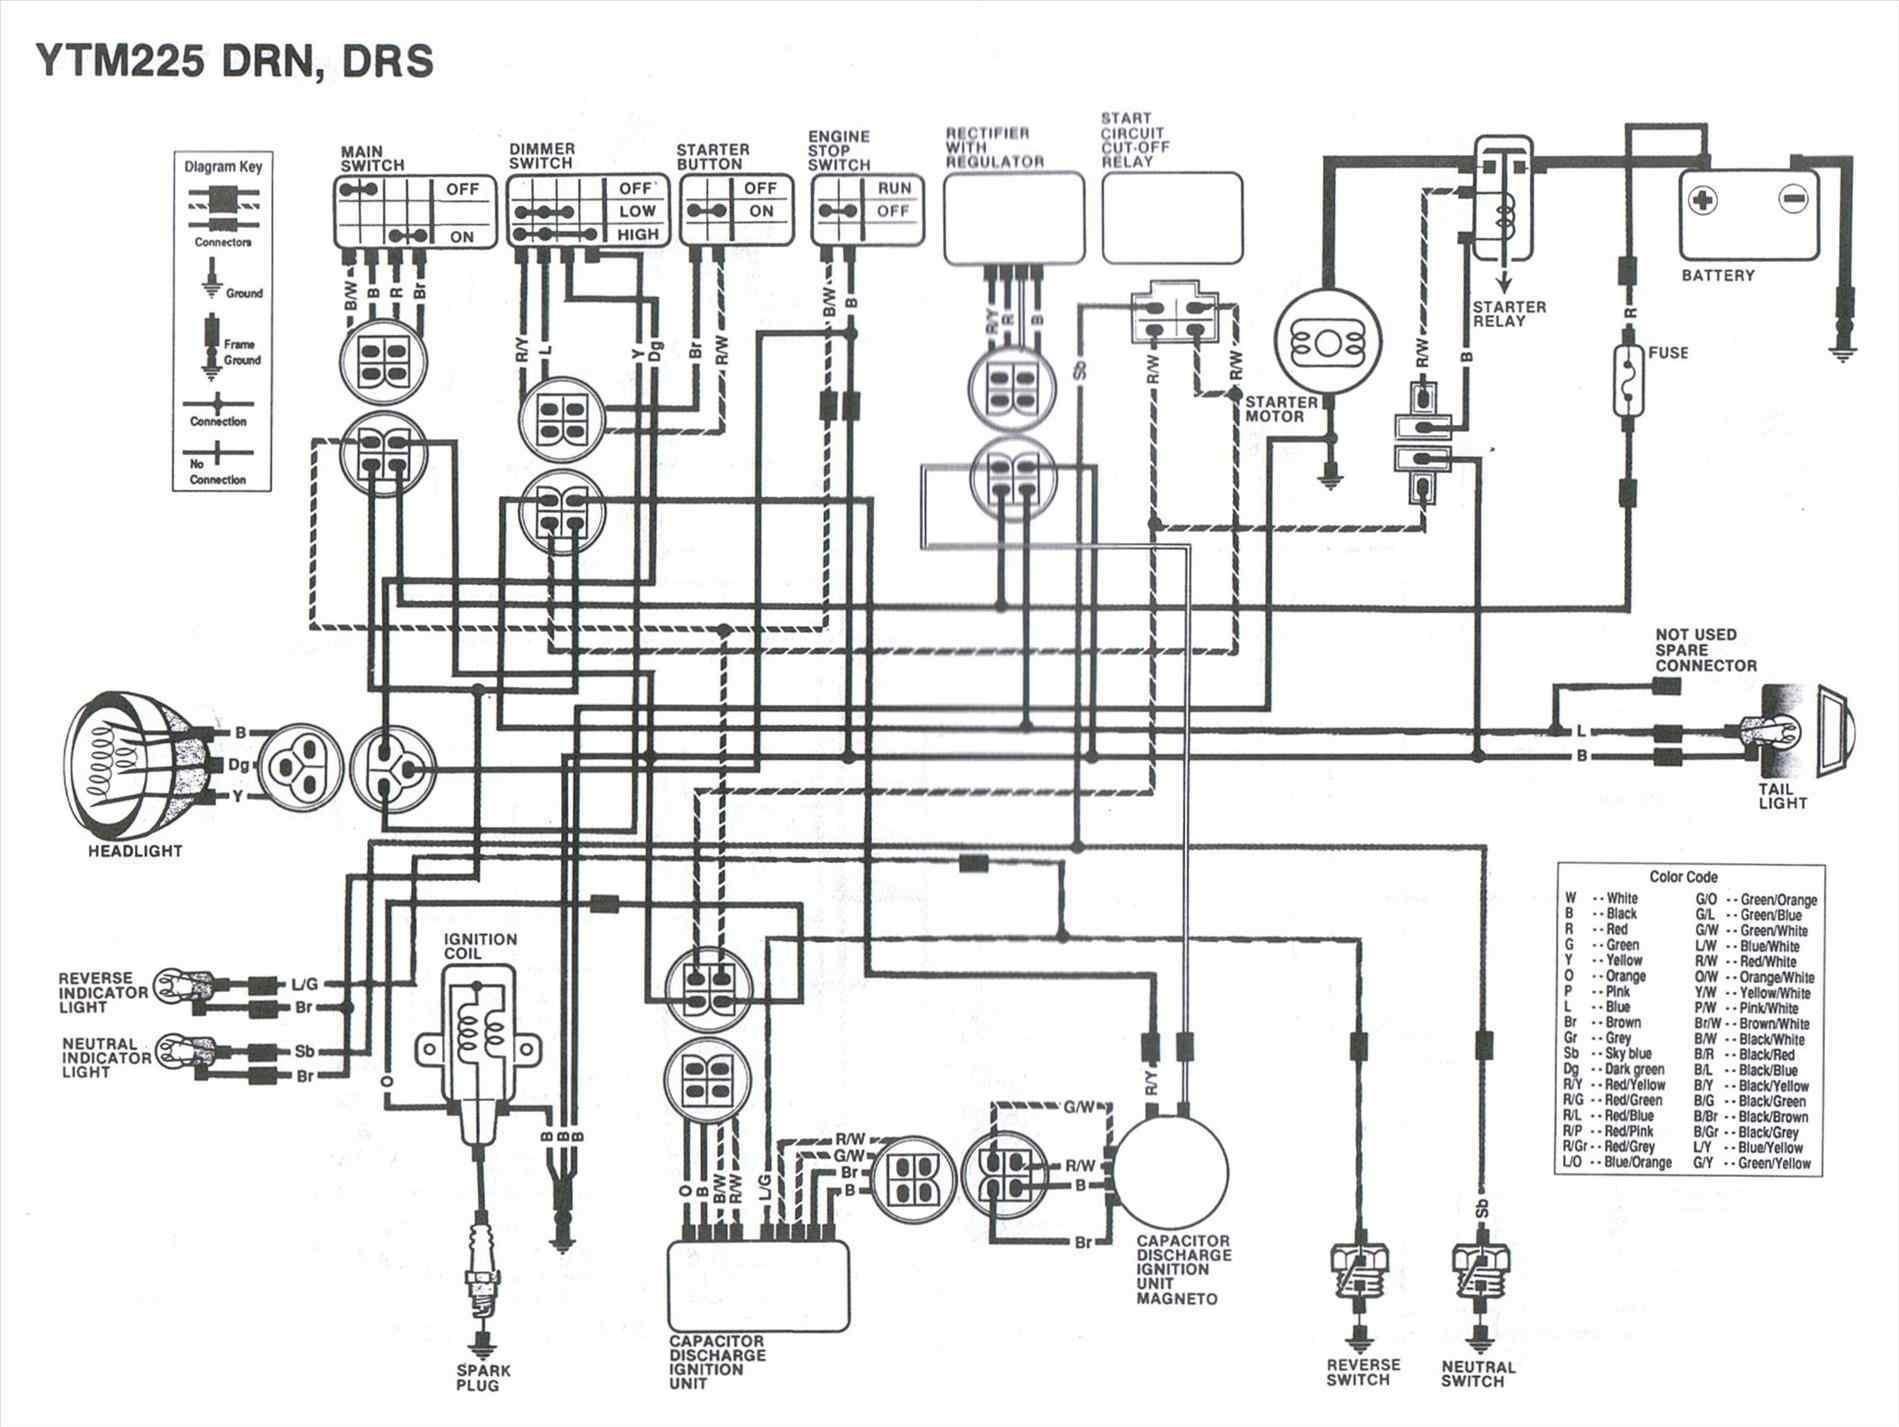 images?q=tbn:ANd9GcQh_l3eQ5xwiPy07kGEXjmjgmBKBRB7H2mRxCGhv1tFWg5c_mWT Motorcycle Wiring Harness Diagram